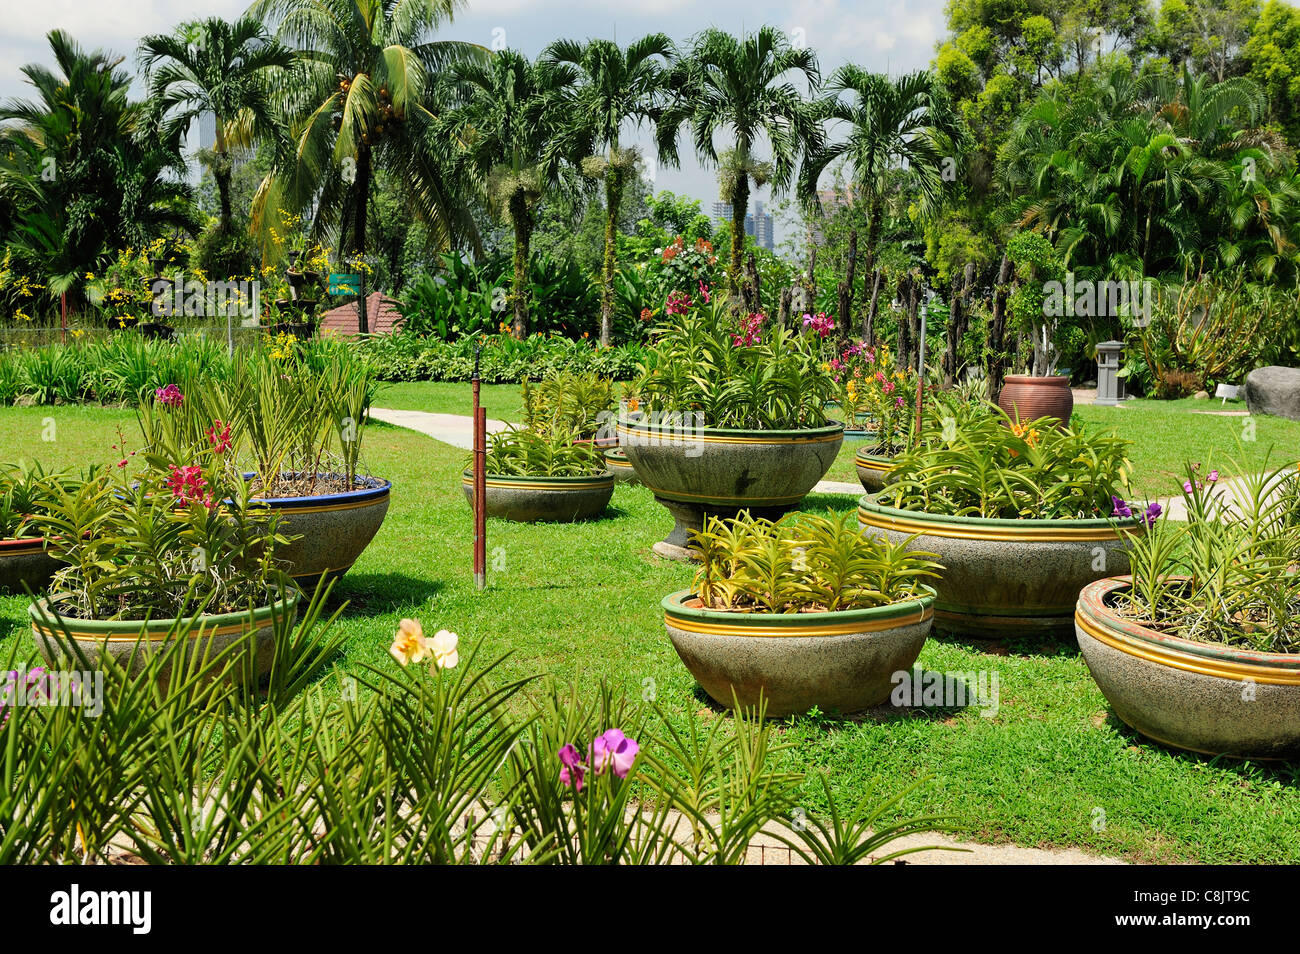 Orchid Garden within the Lake Gardens (Taman Tasik Perdana), Kuala Lumpur, Malaysia - Stock Image